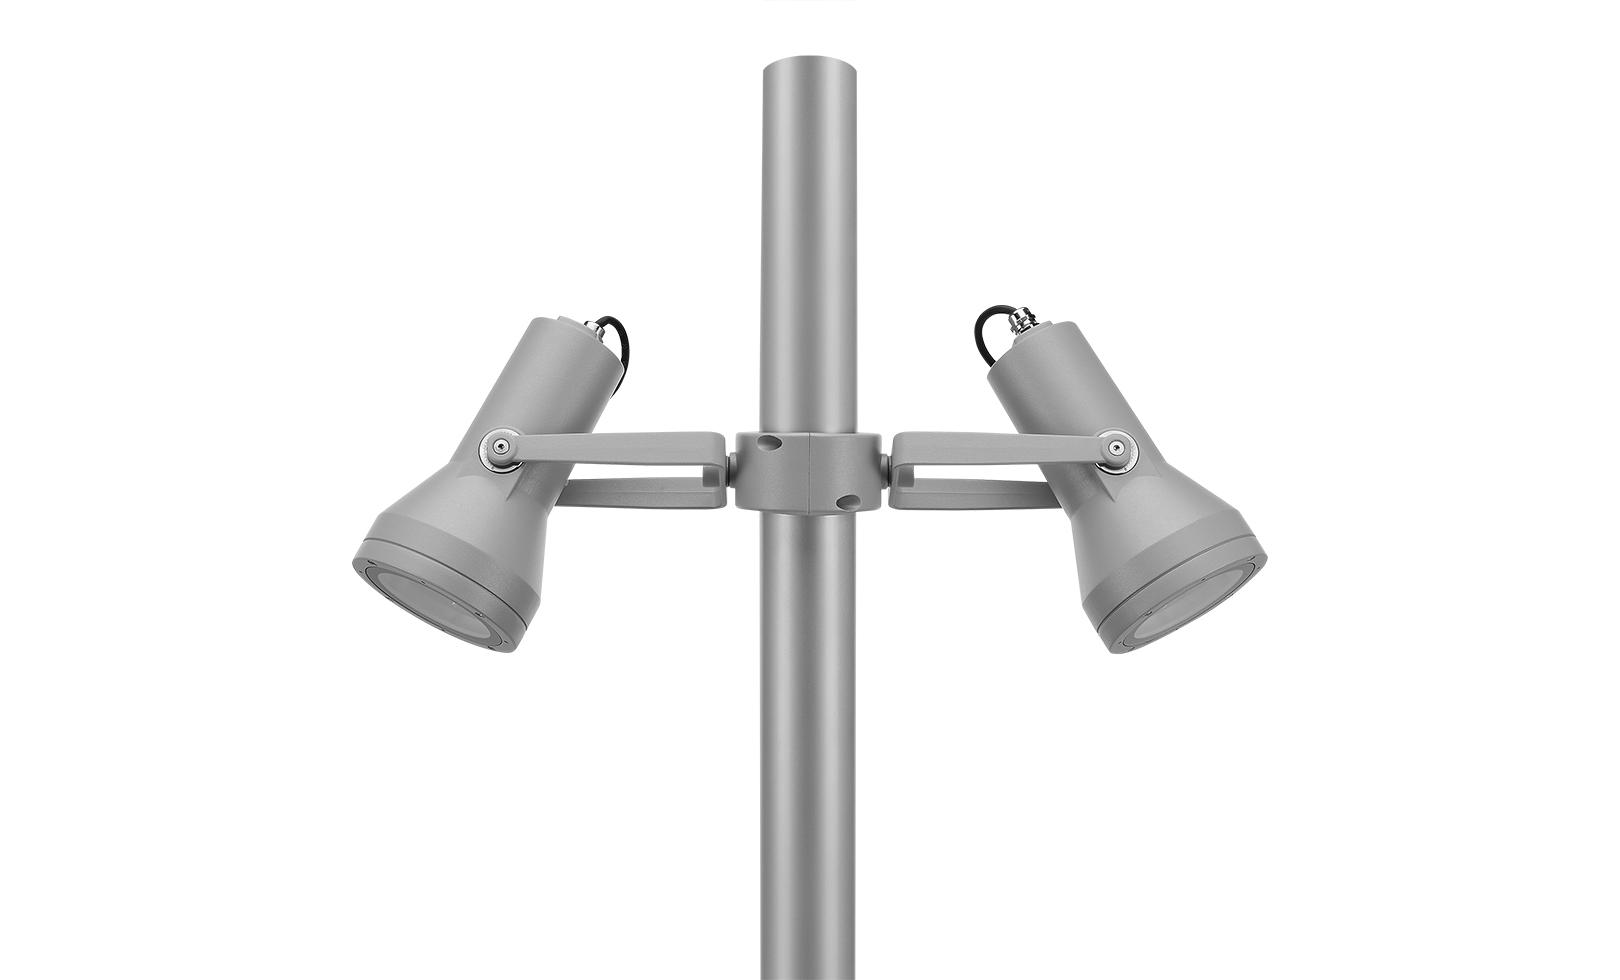 805002-805006 FLASH POLE MEDIUM COB LED 18W 4